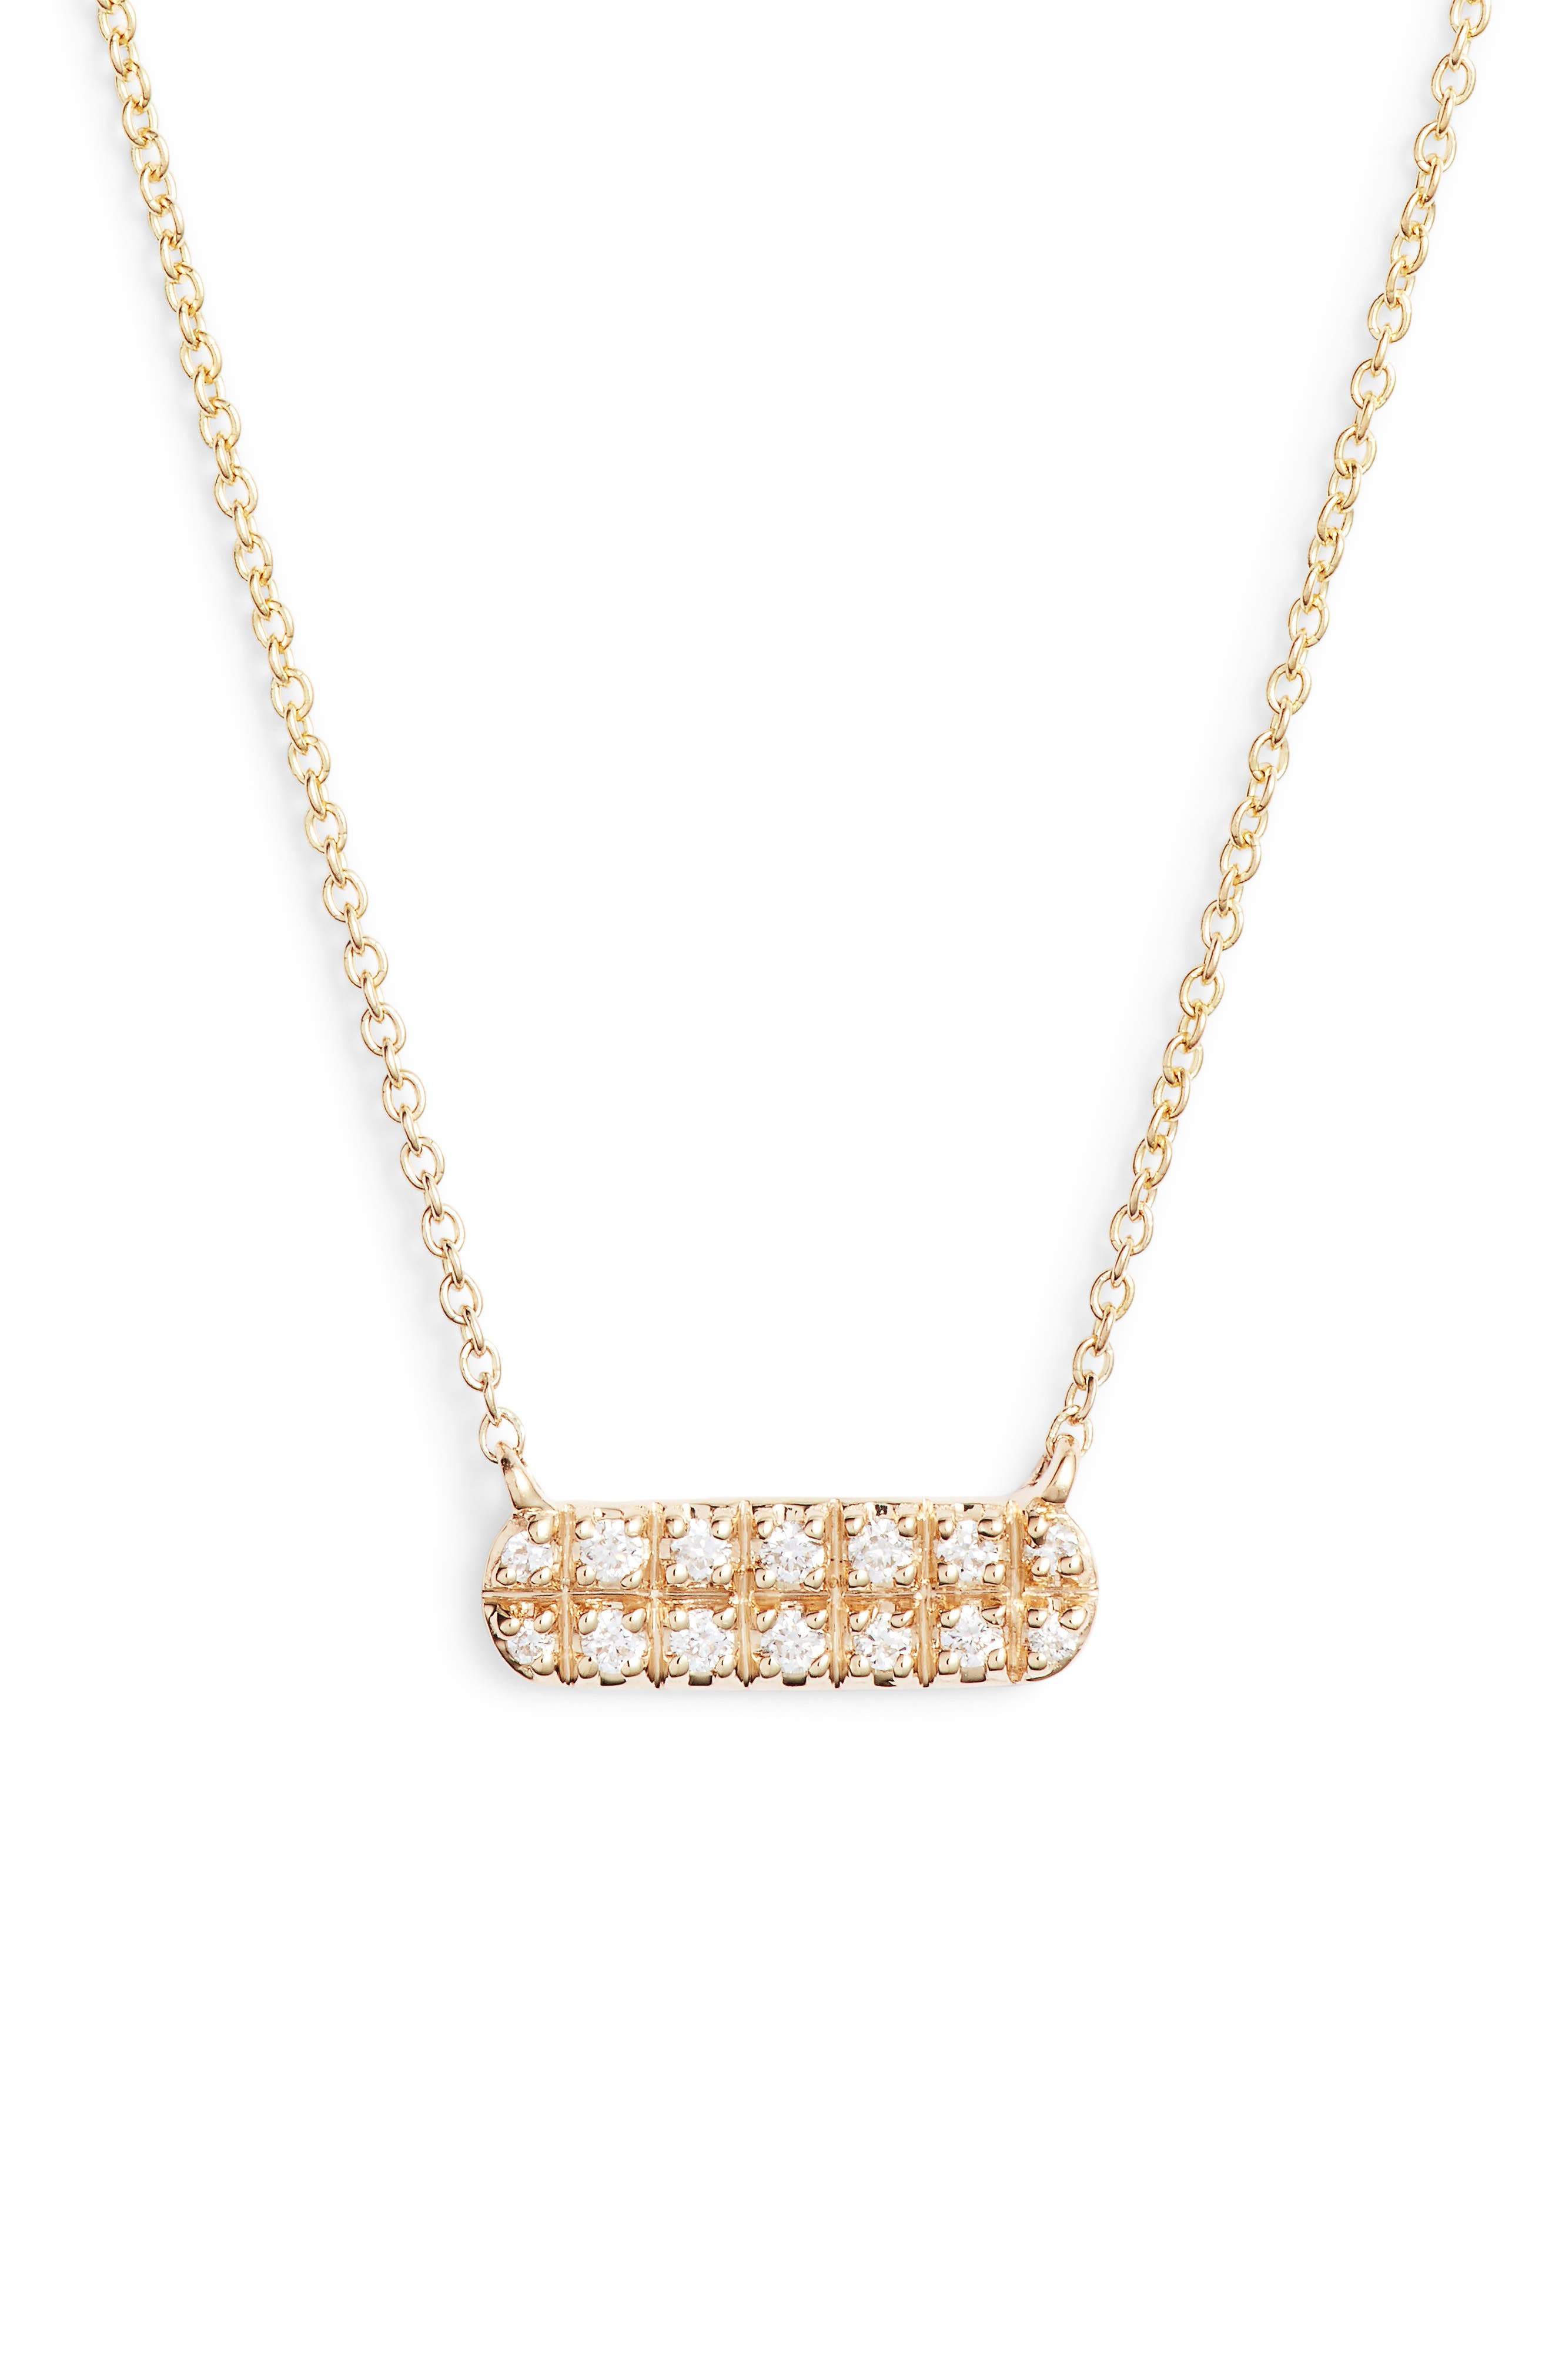 DANA REBECCA DESIGNS,                             Dana Rebecca Sylvie Rose Mini Bar Necklace,                             Main thumbnail 1, color,                             YELLOW GOLD